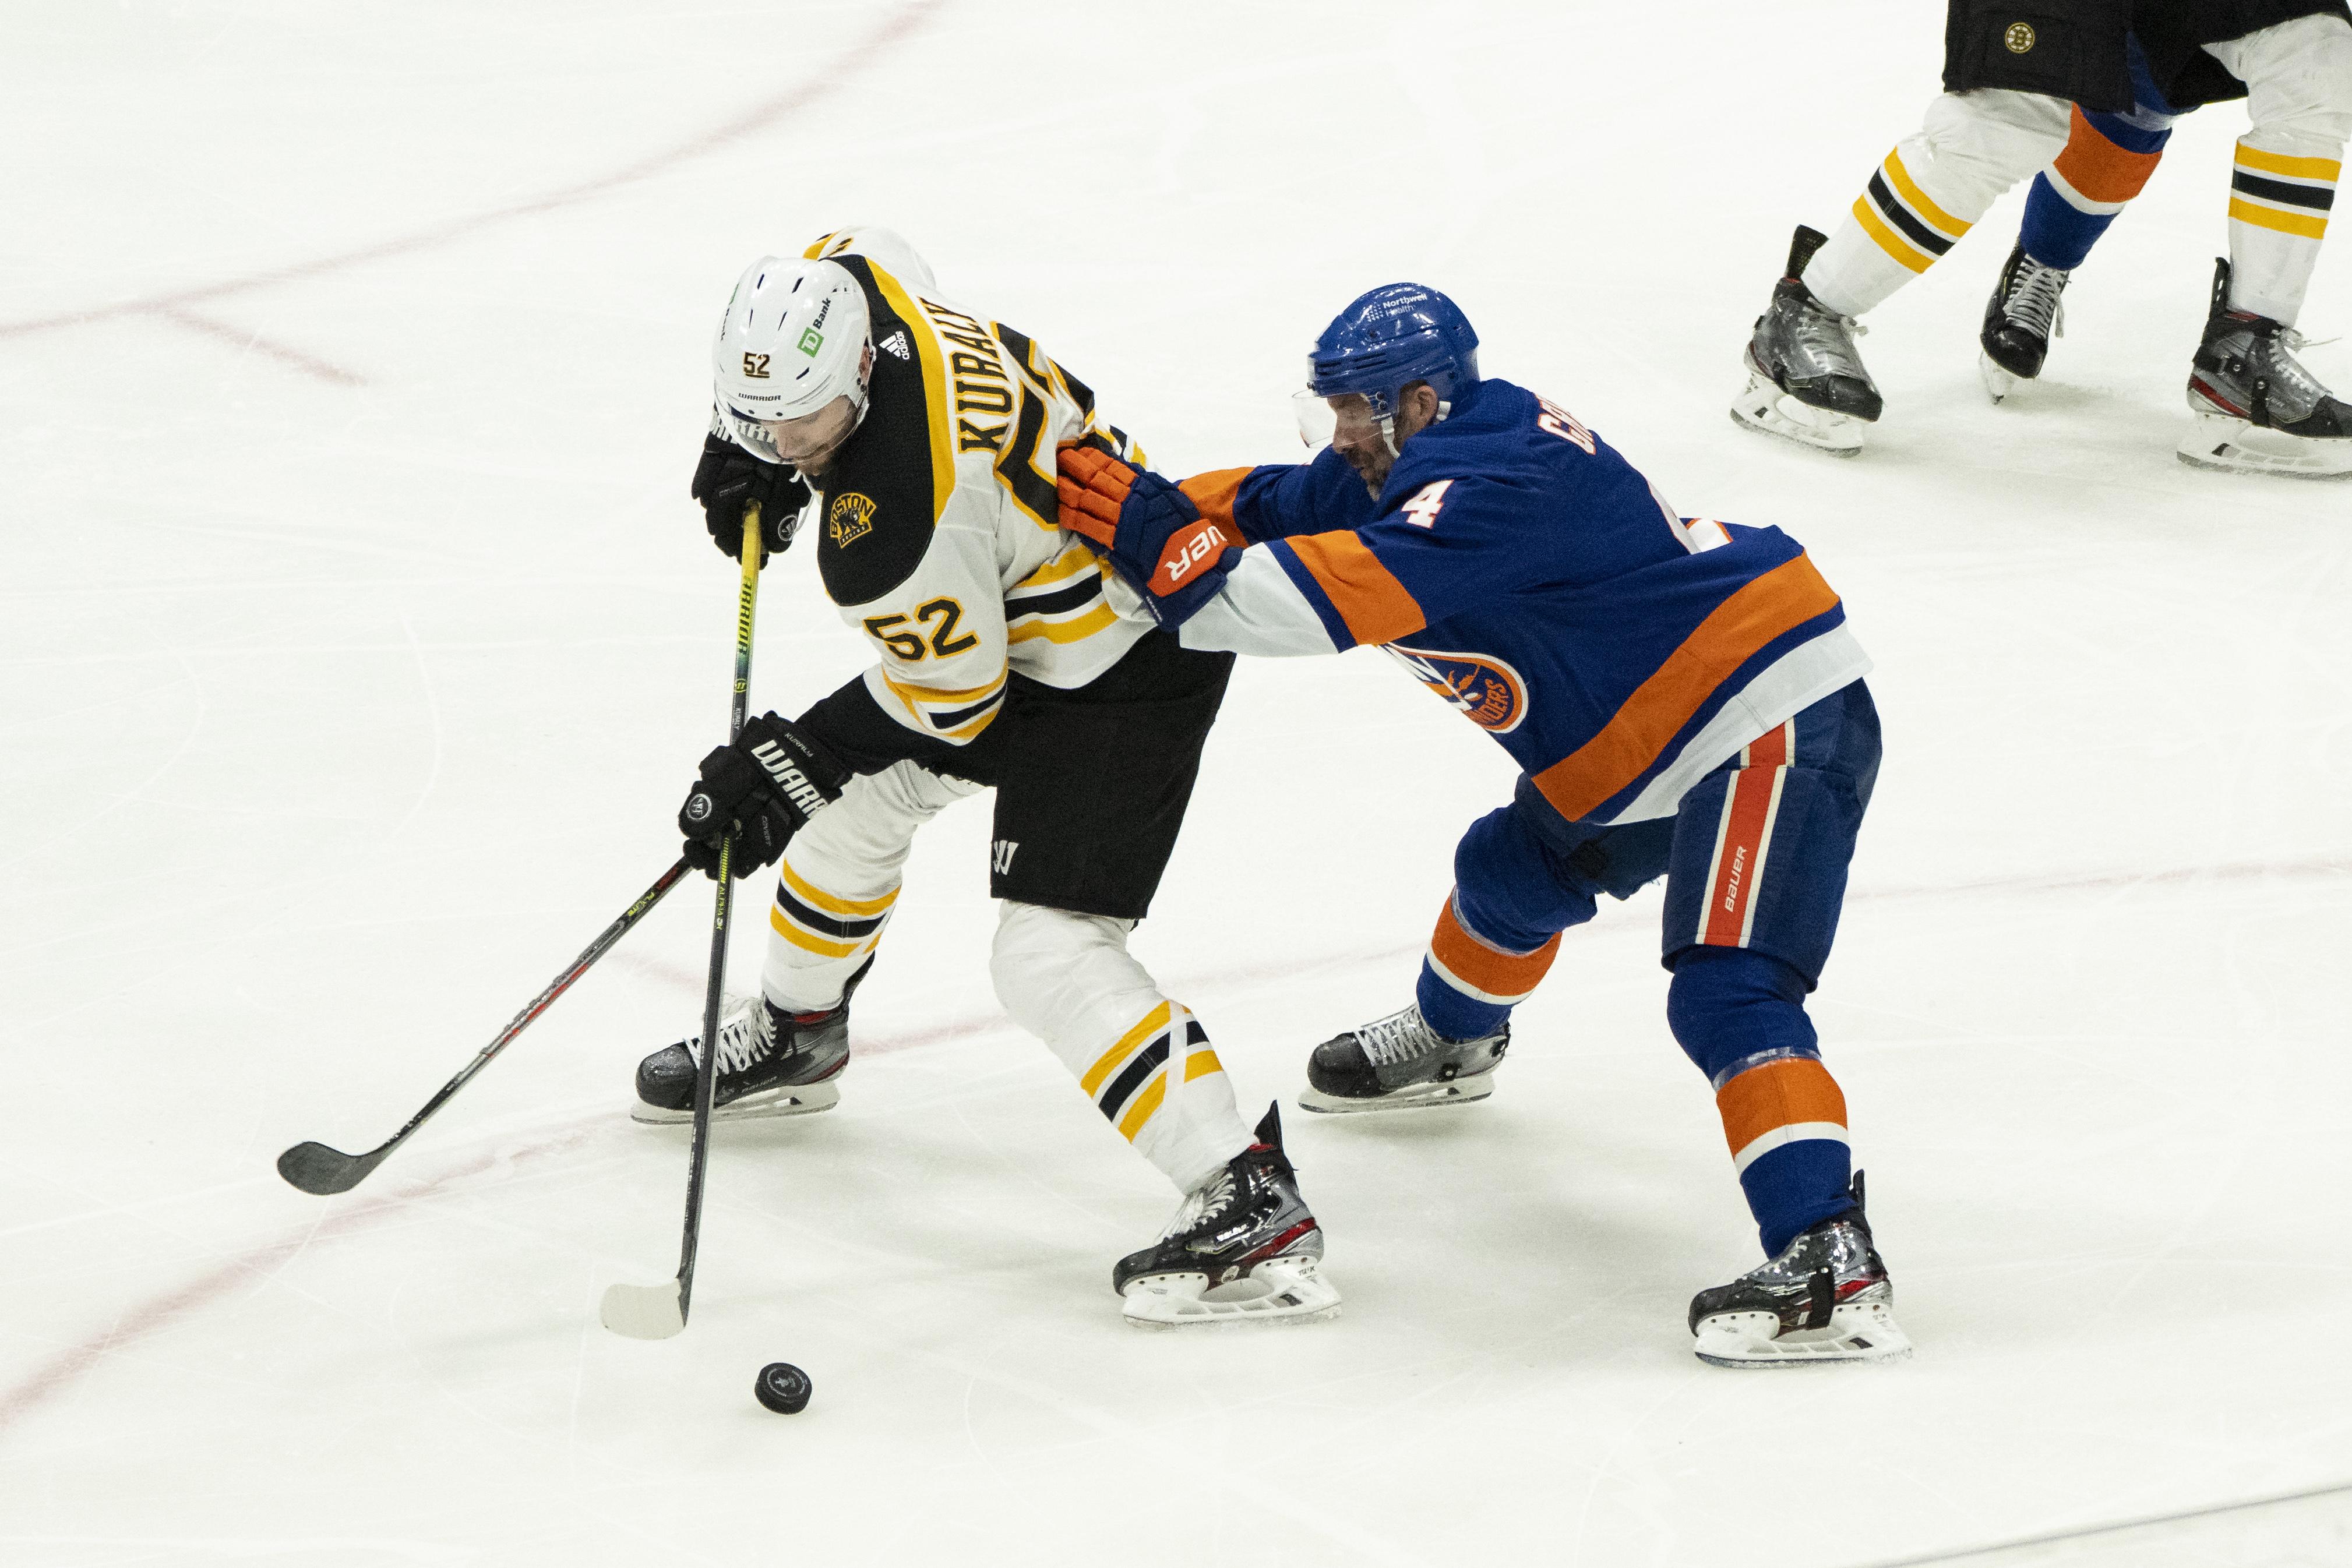 NHL: JUN 09 Stanley Cup Playoffs Second Round - Bruins at Islanders